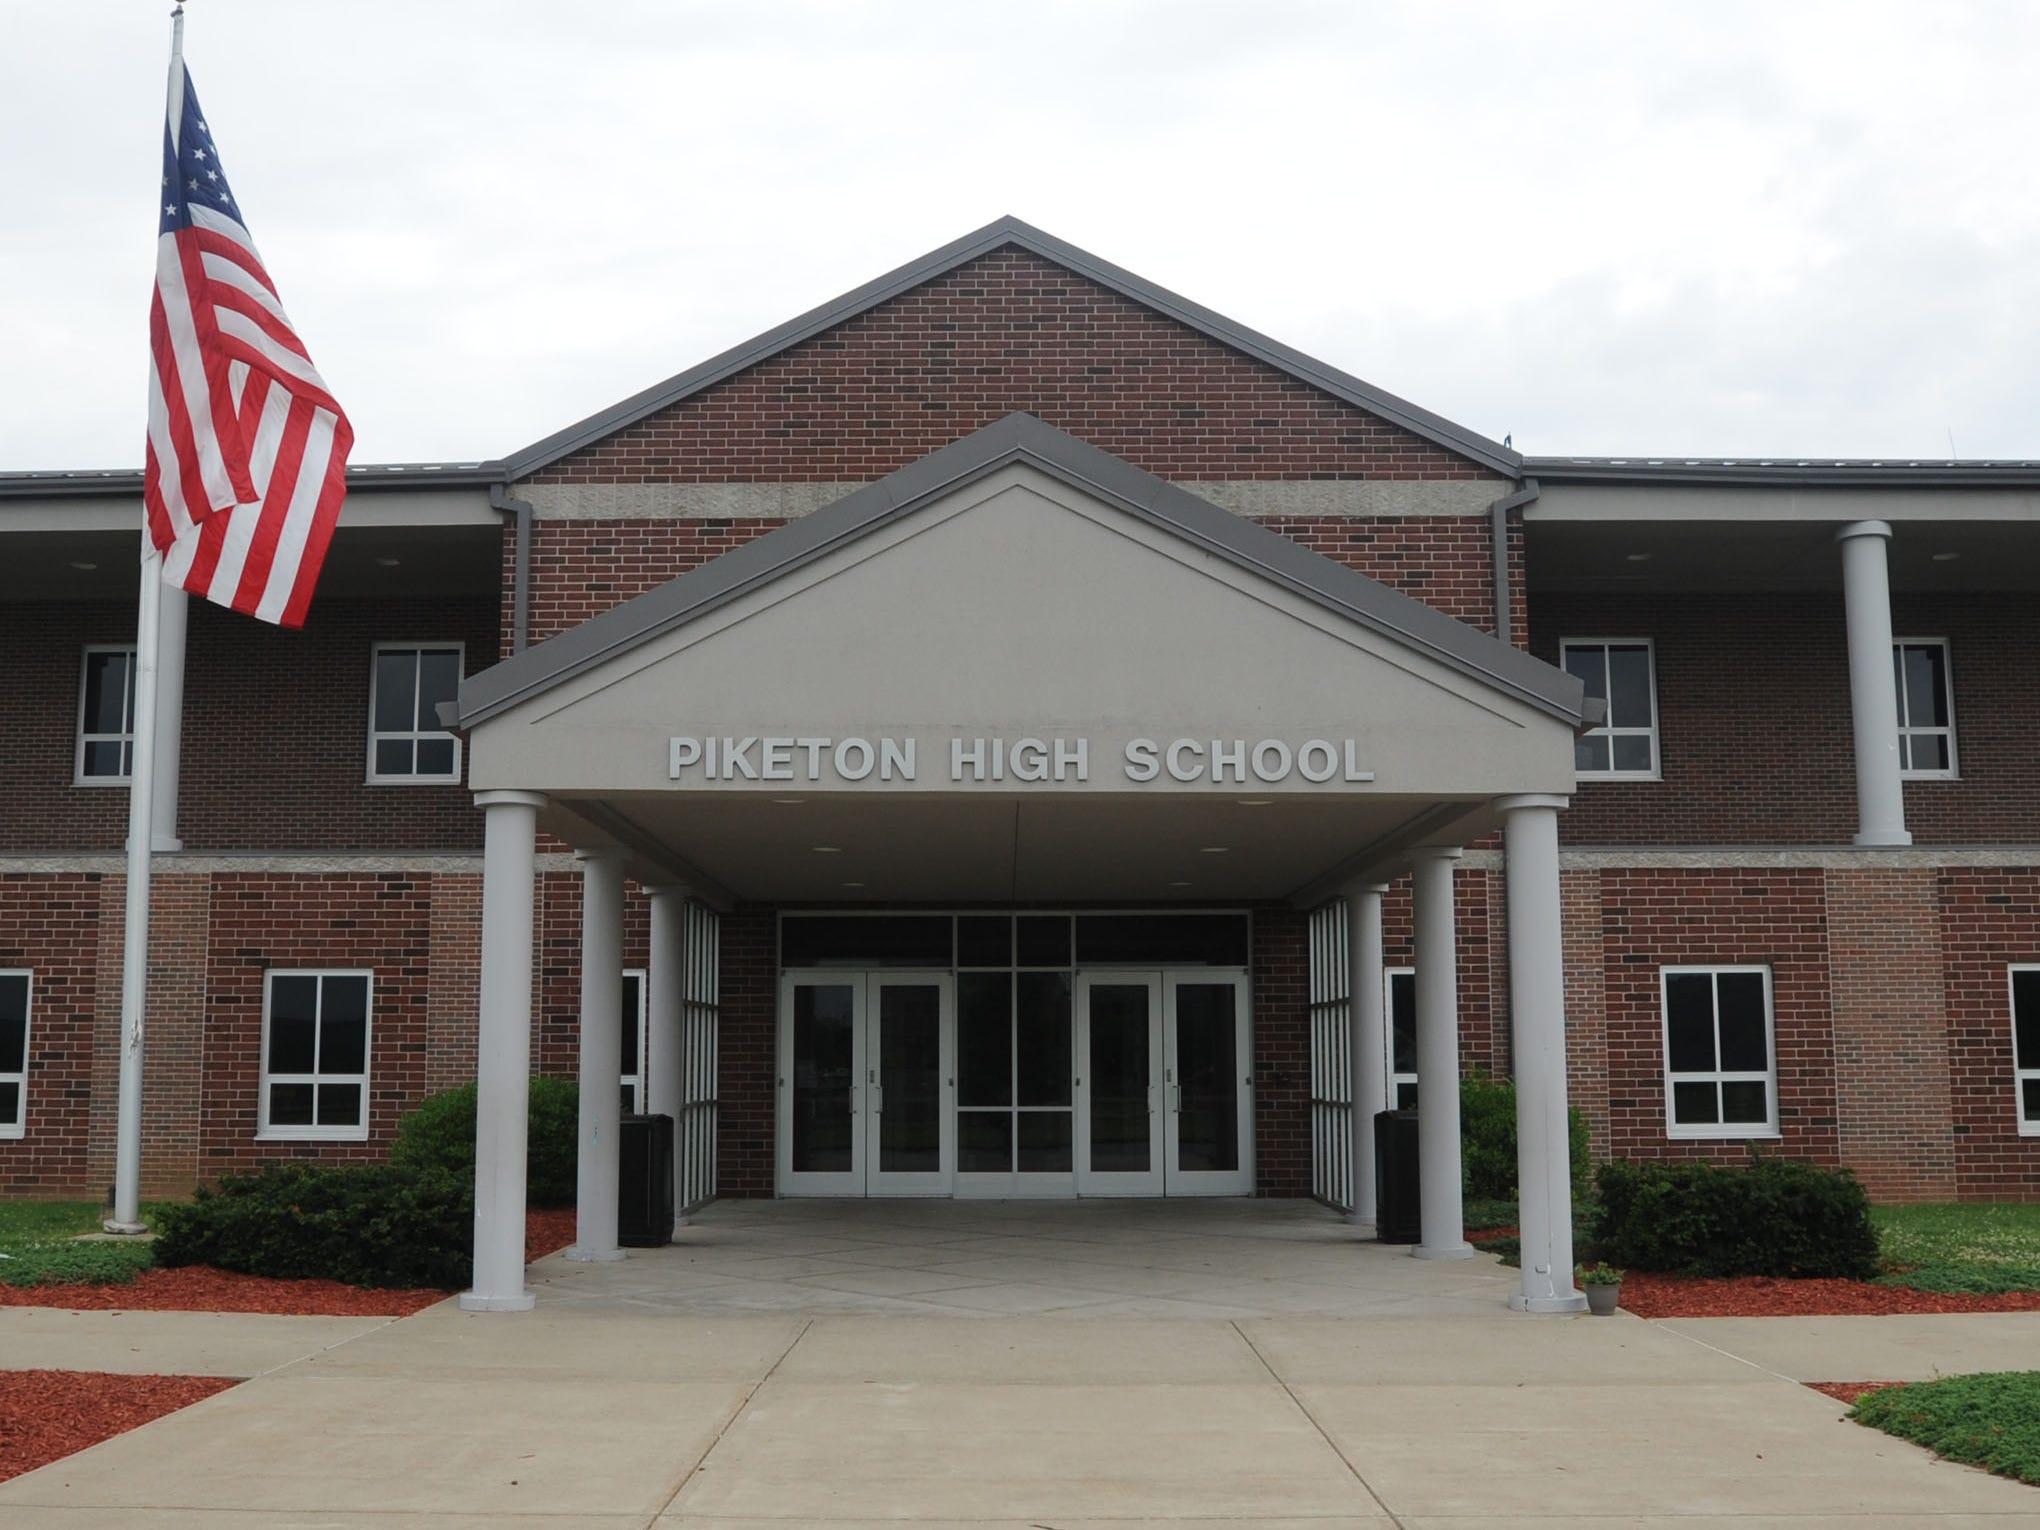 Piketon High School